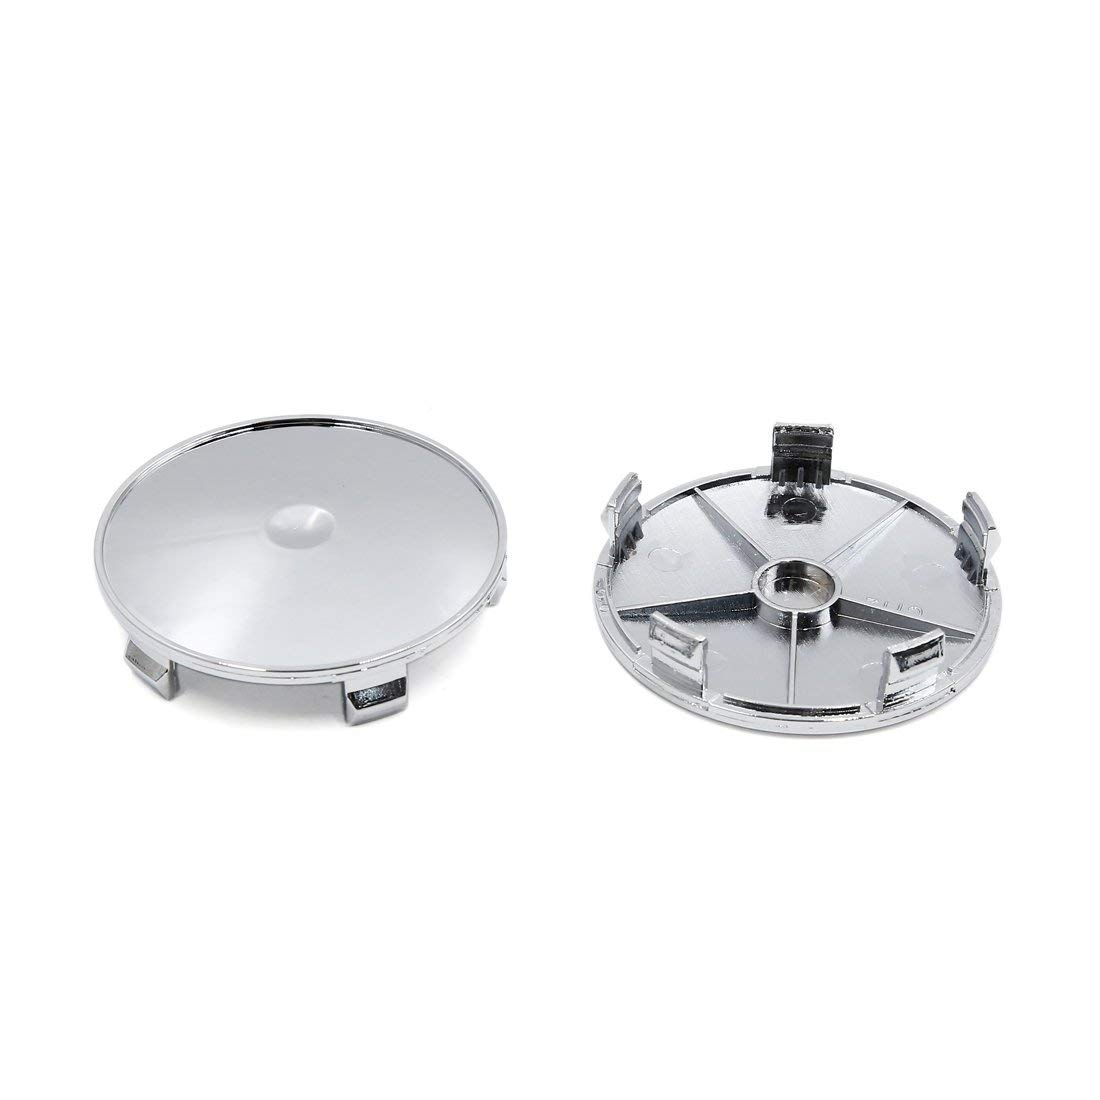 4 Pcs 68mm Dia 5 Lugs Auto Car Tire Wheel Rim Center Hub Caps Cover Silver Tone